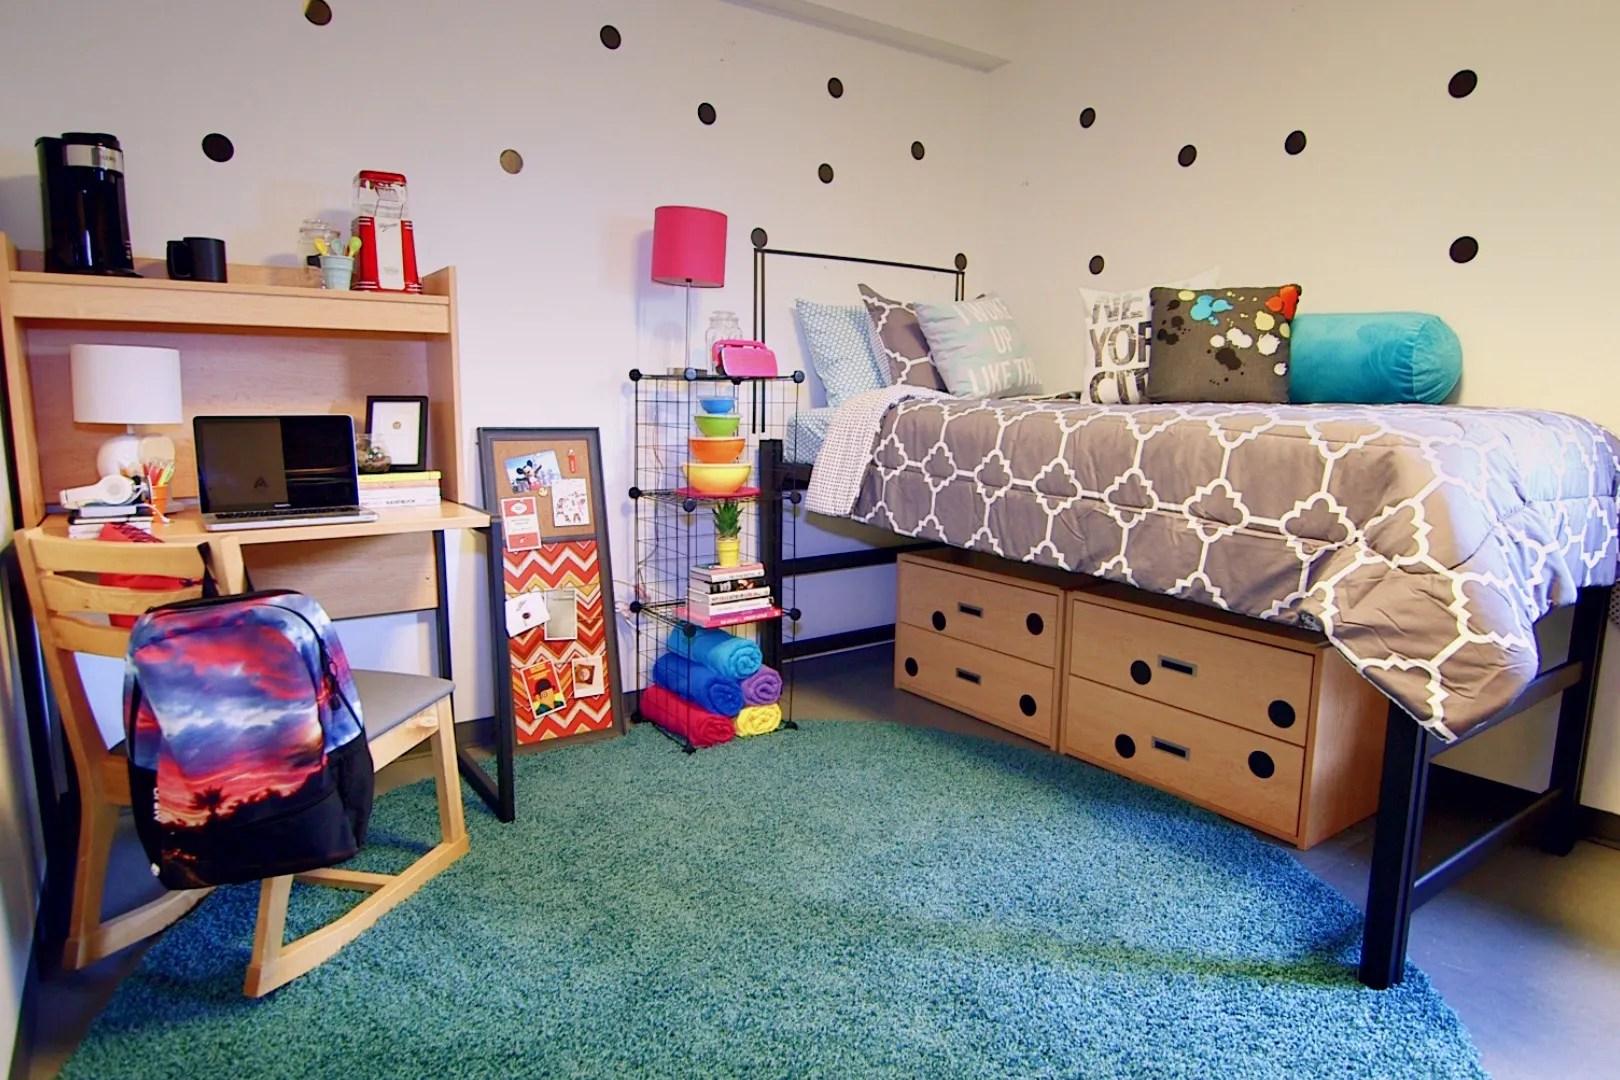 Fullsize Of Dorm Room Idea